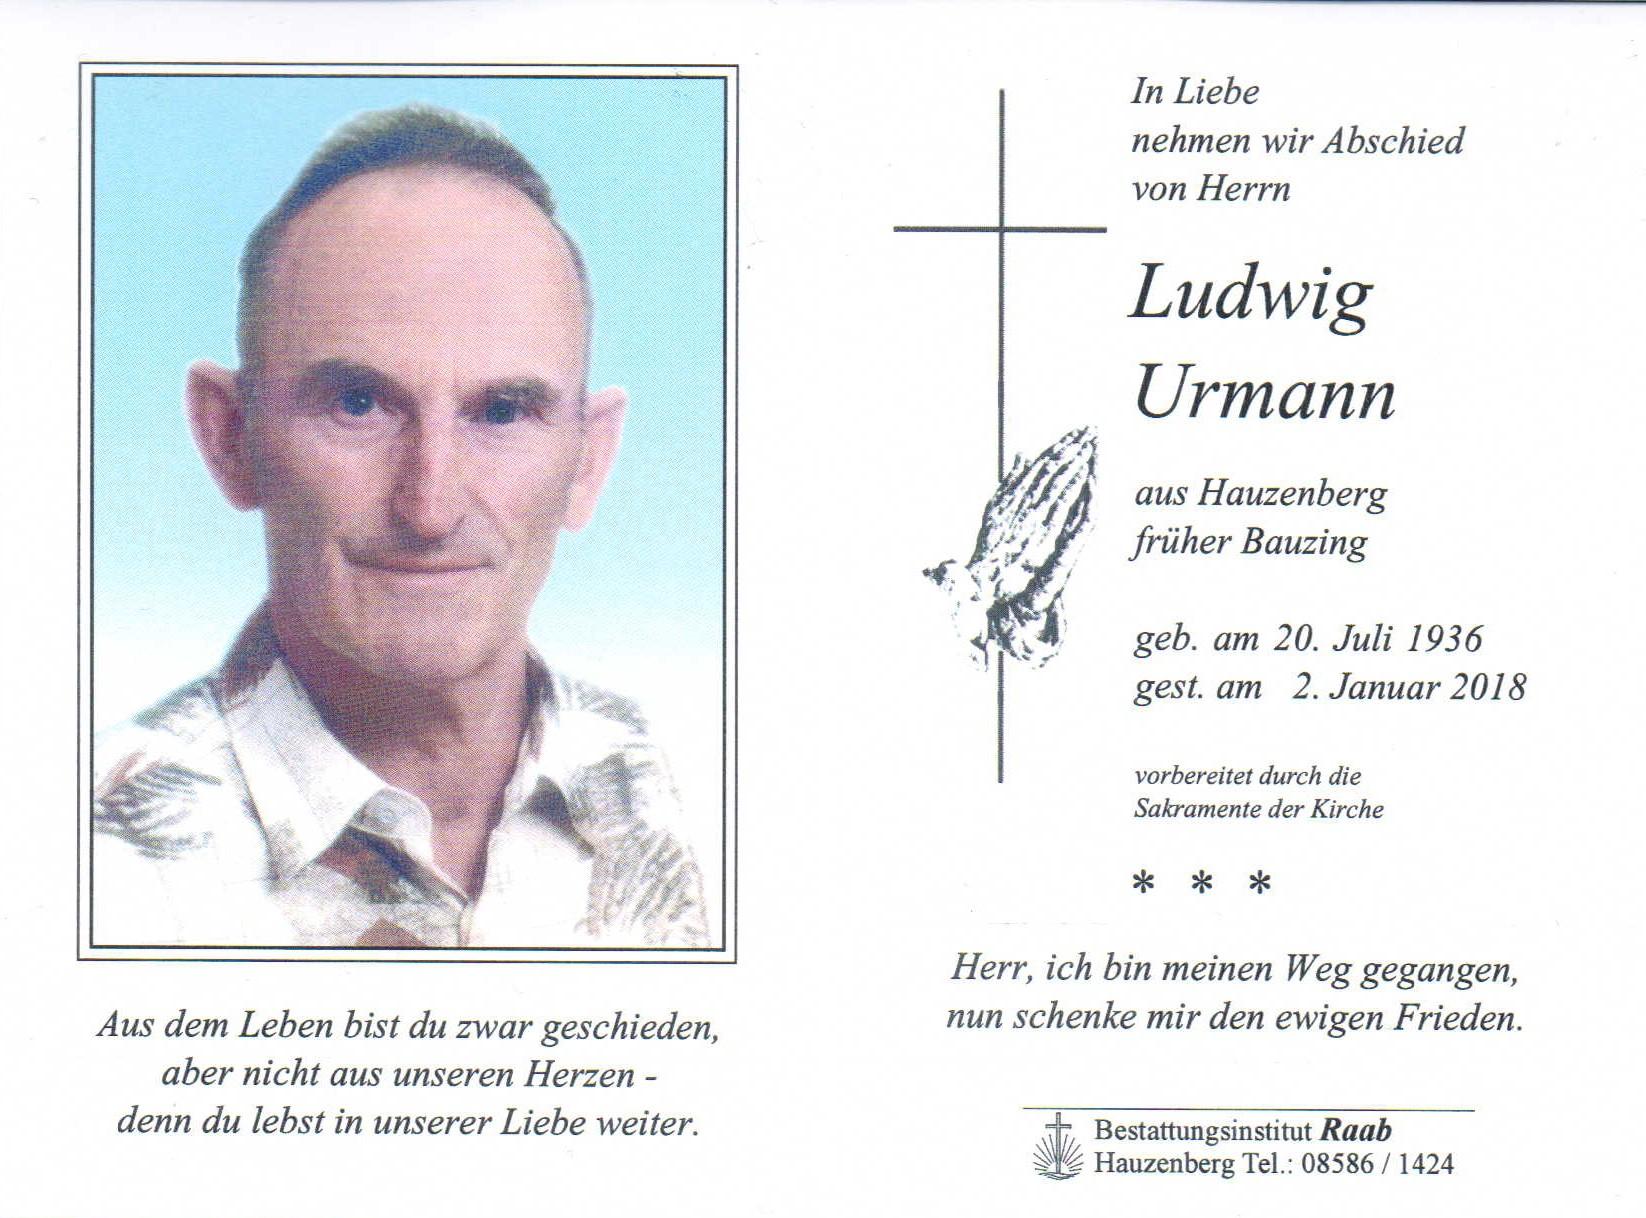 2018-01-02-Urmann-Ludwig-Bauzing-Hauzenberg